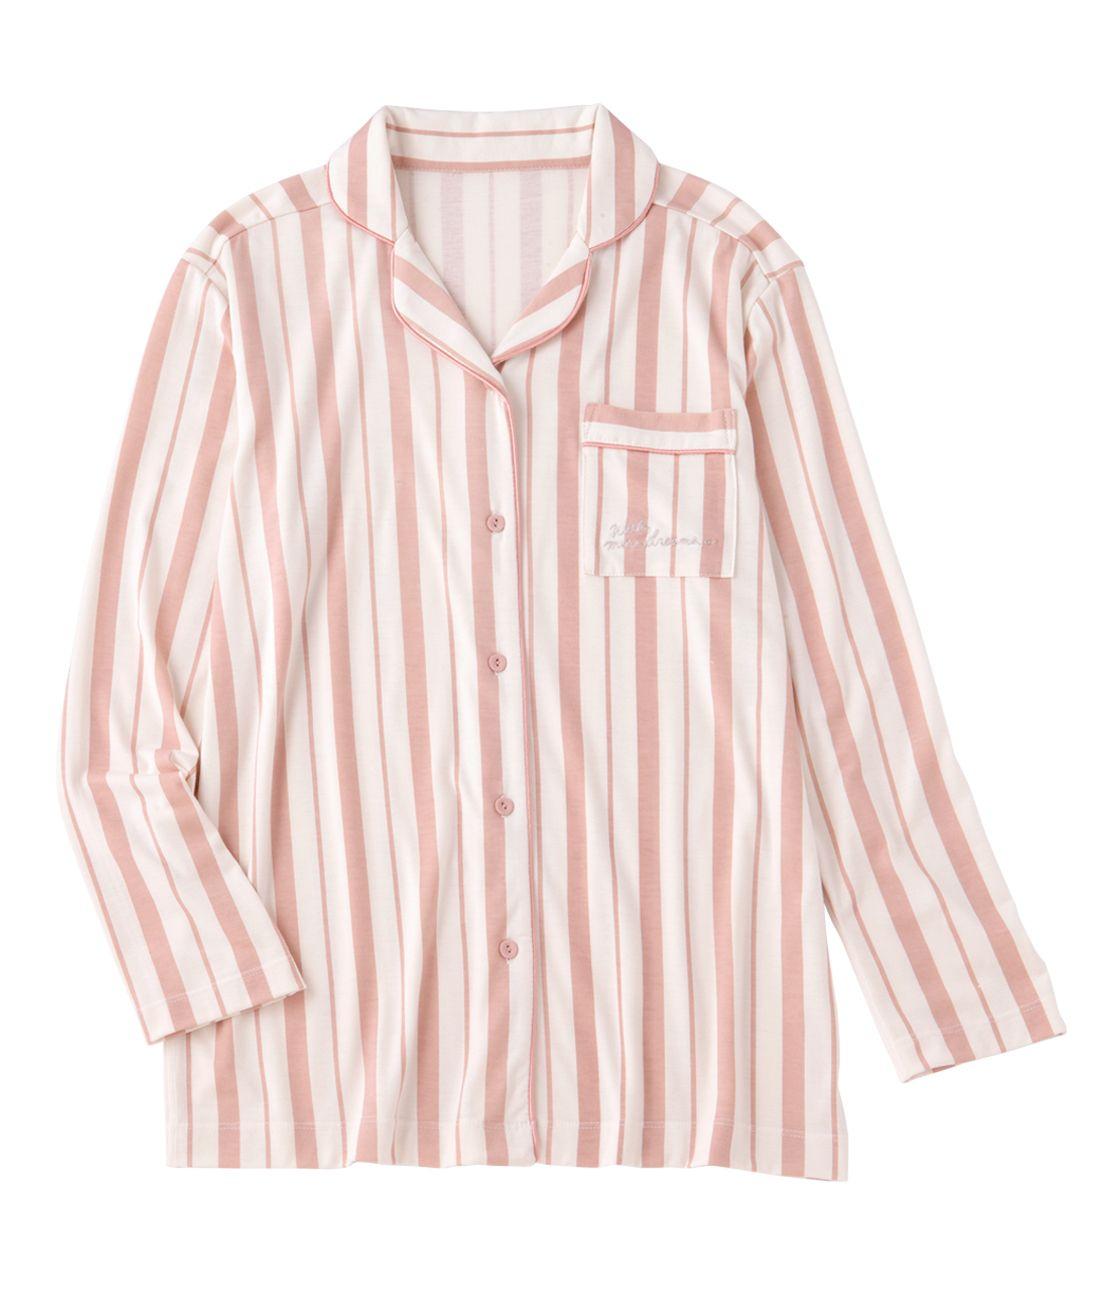 PICK & MIX long-sleeved pajama shirt